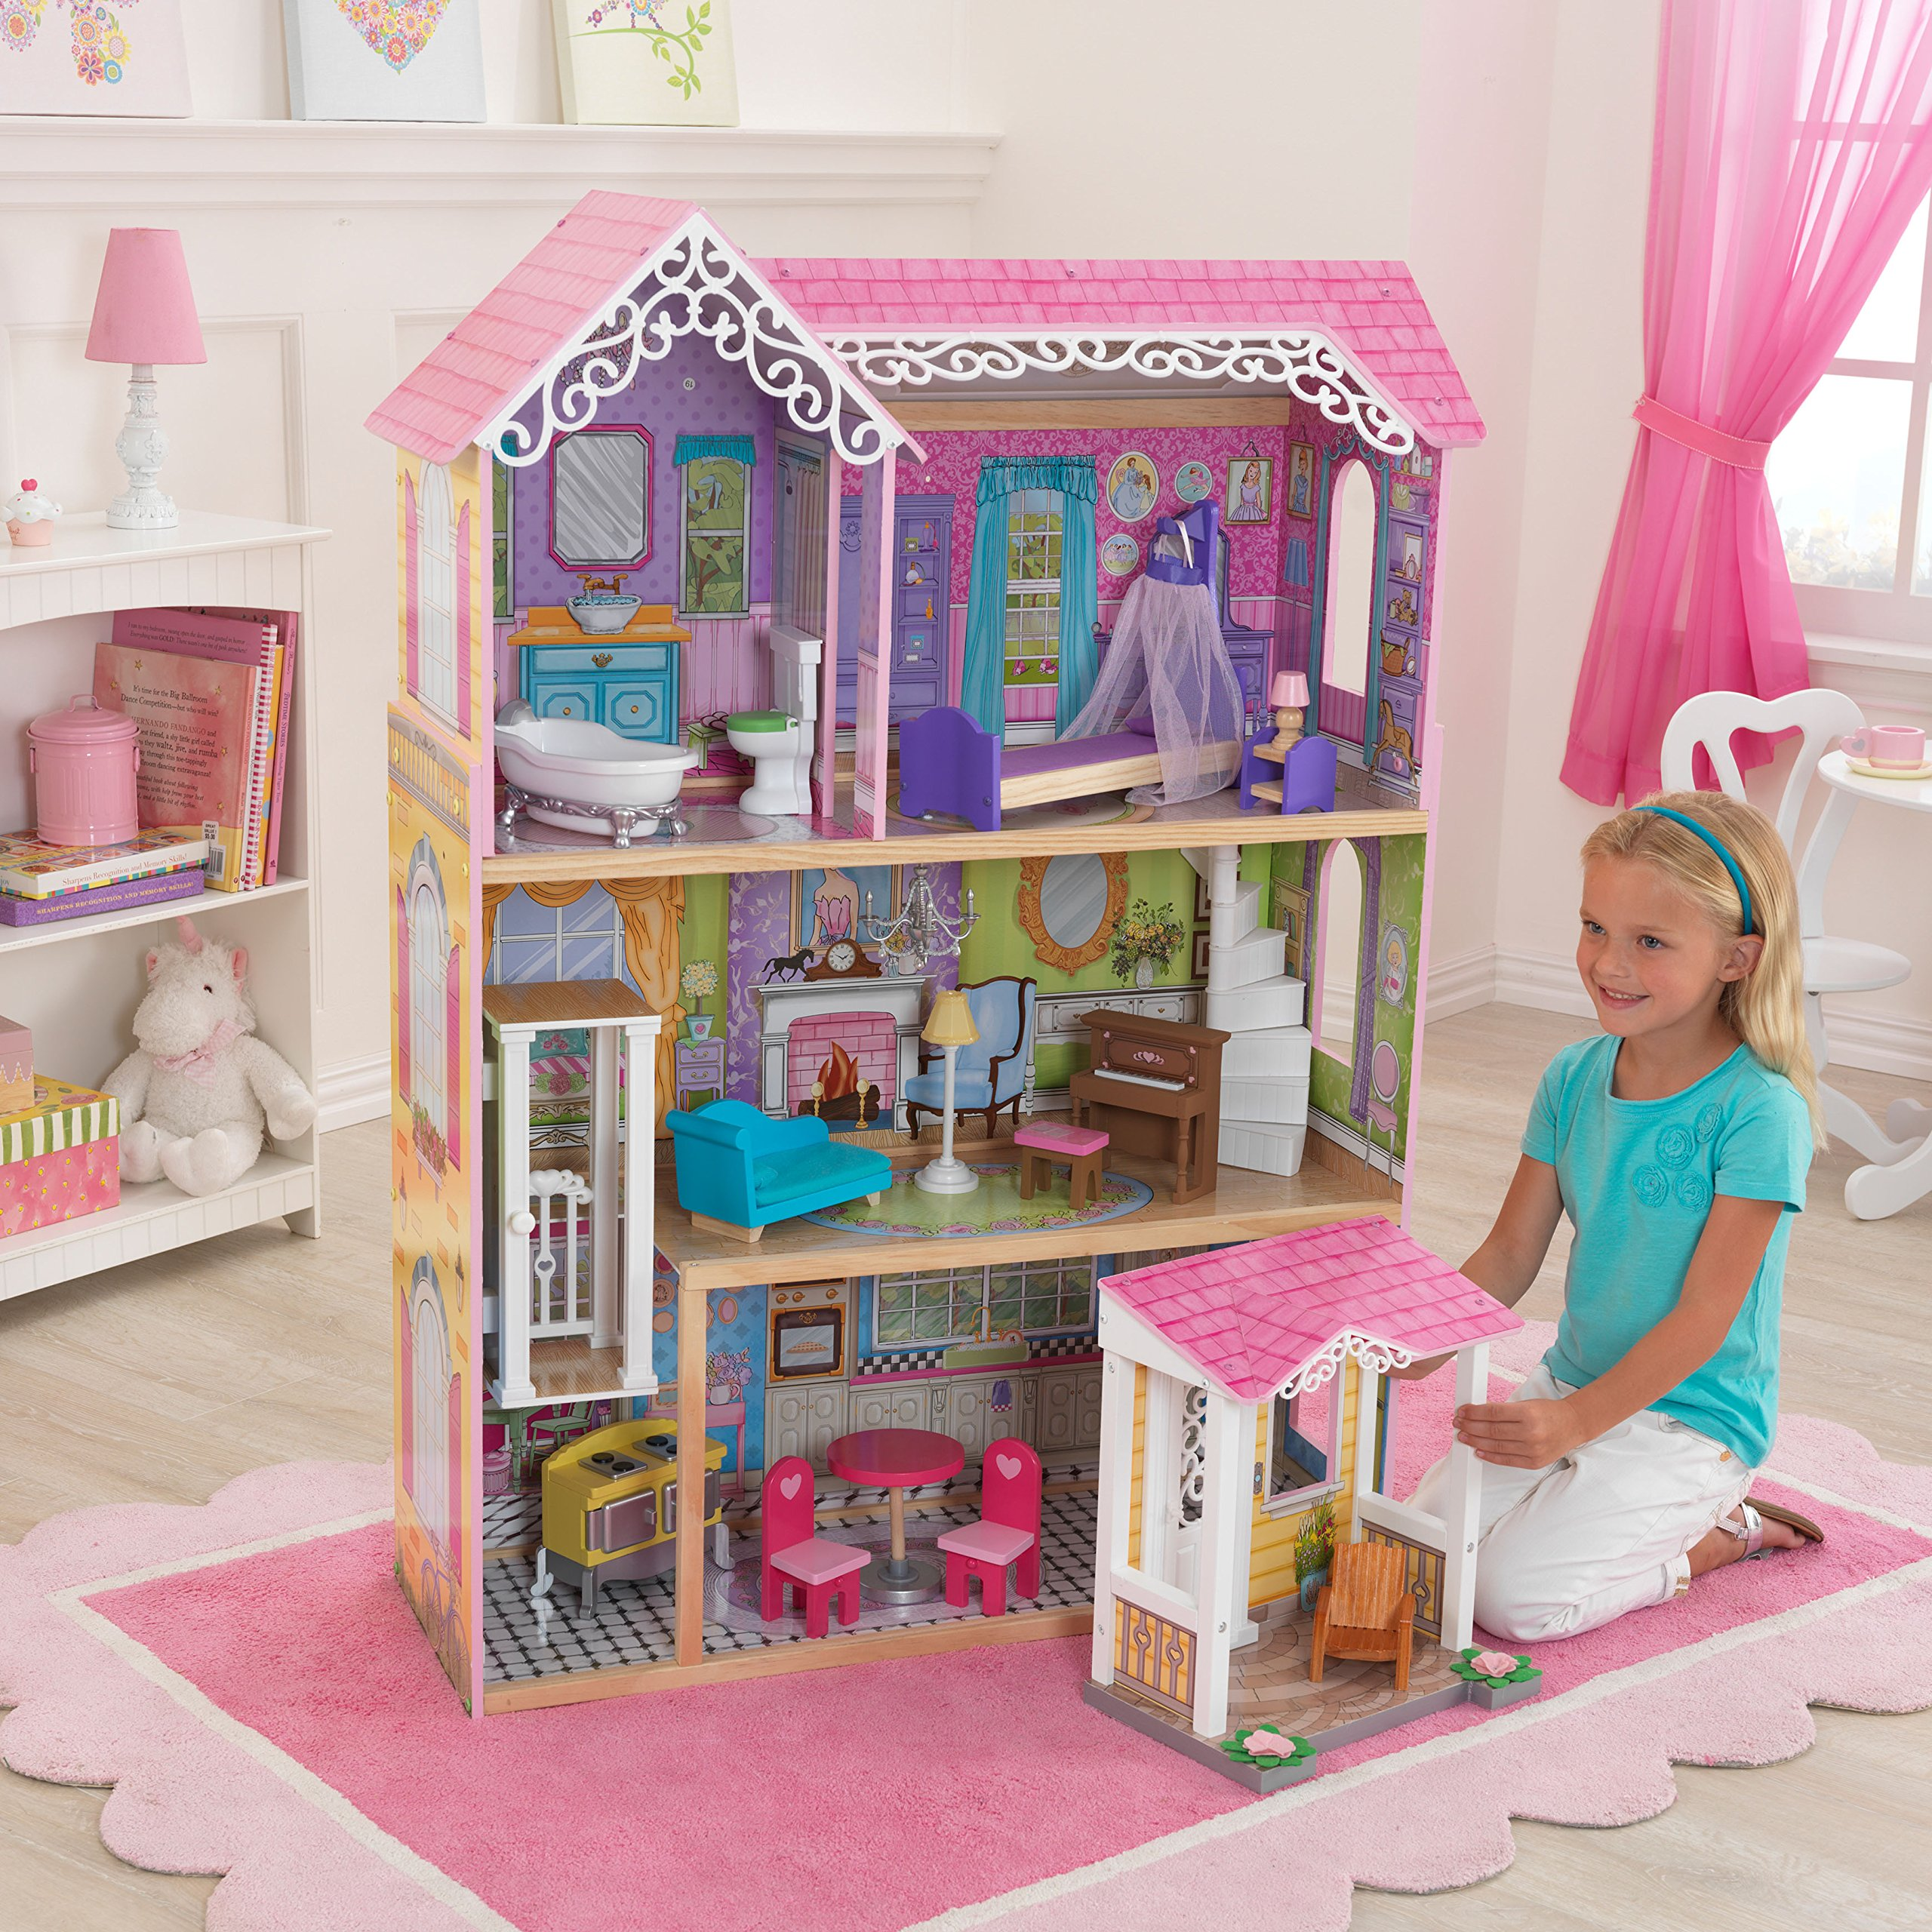 KidKraft Sweet & Pretty Dollhouse Toy by KidKraft (Image #3)